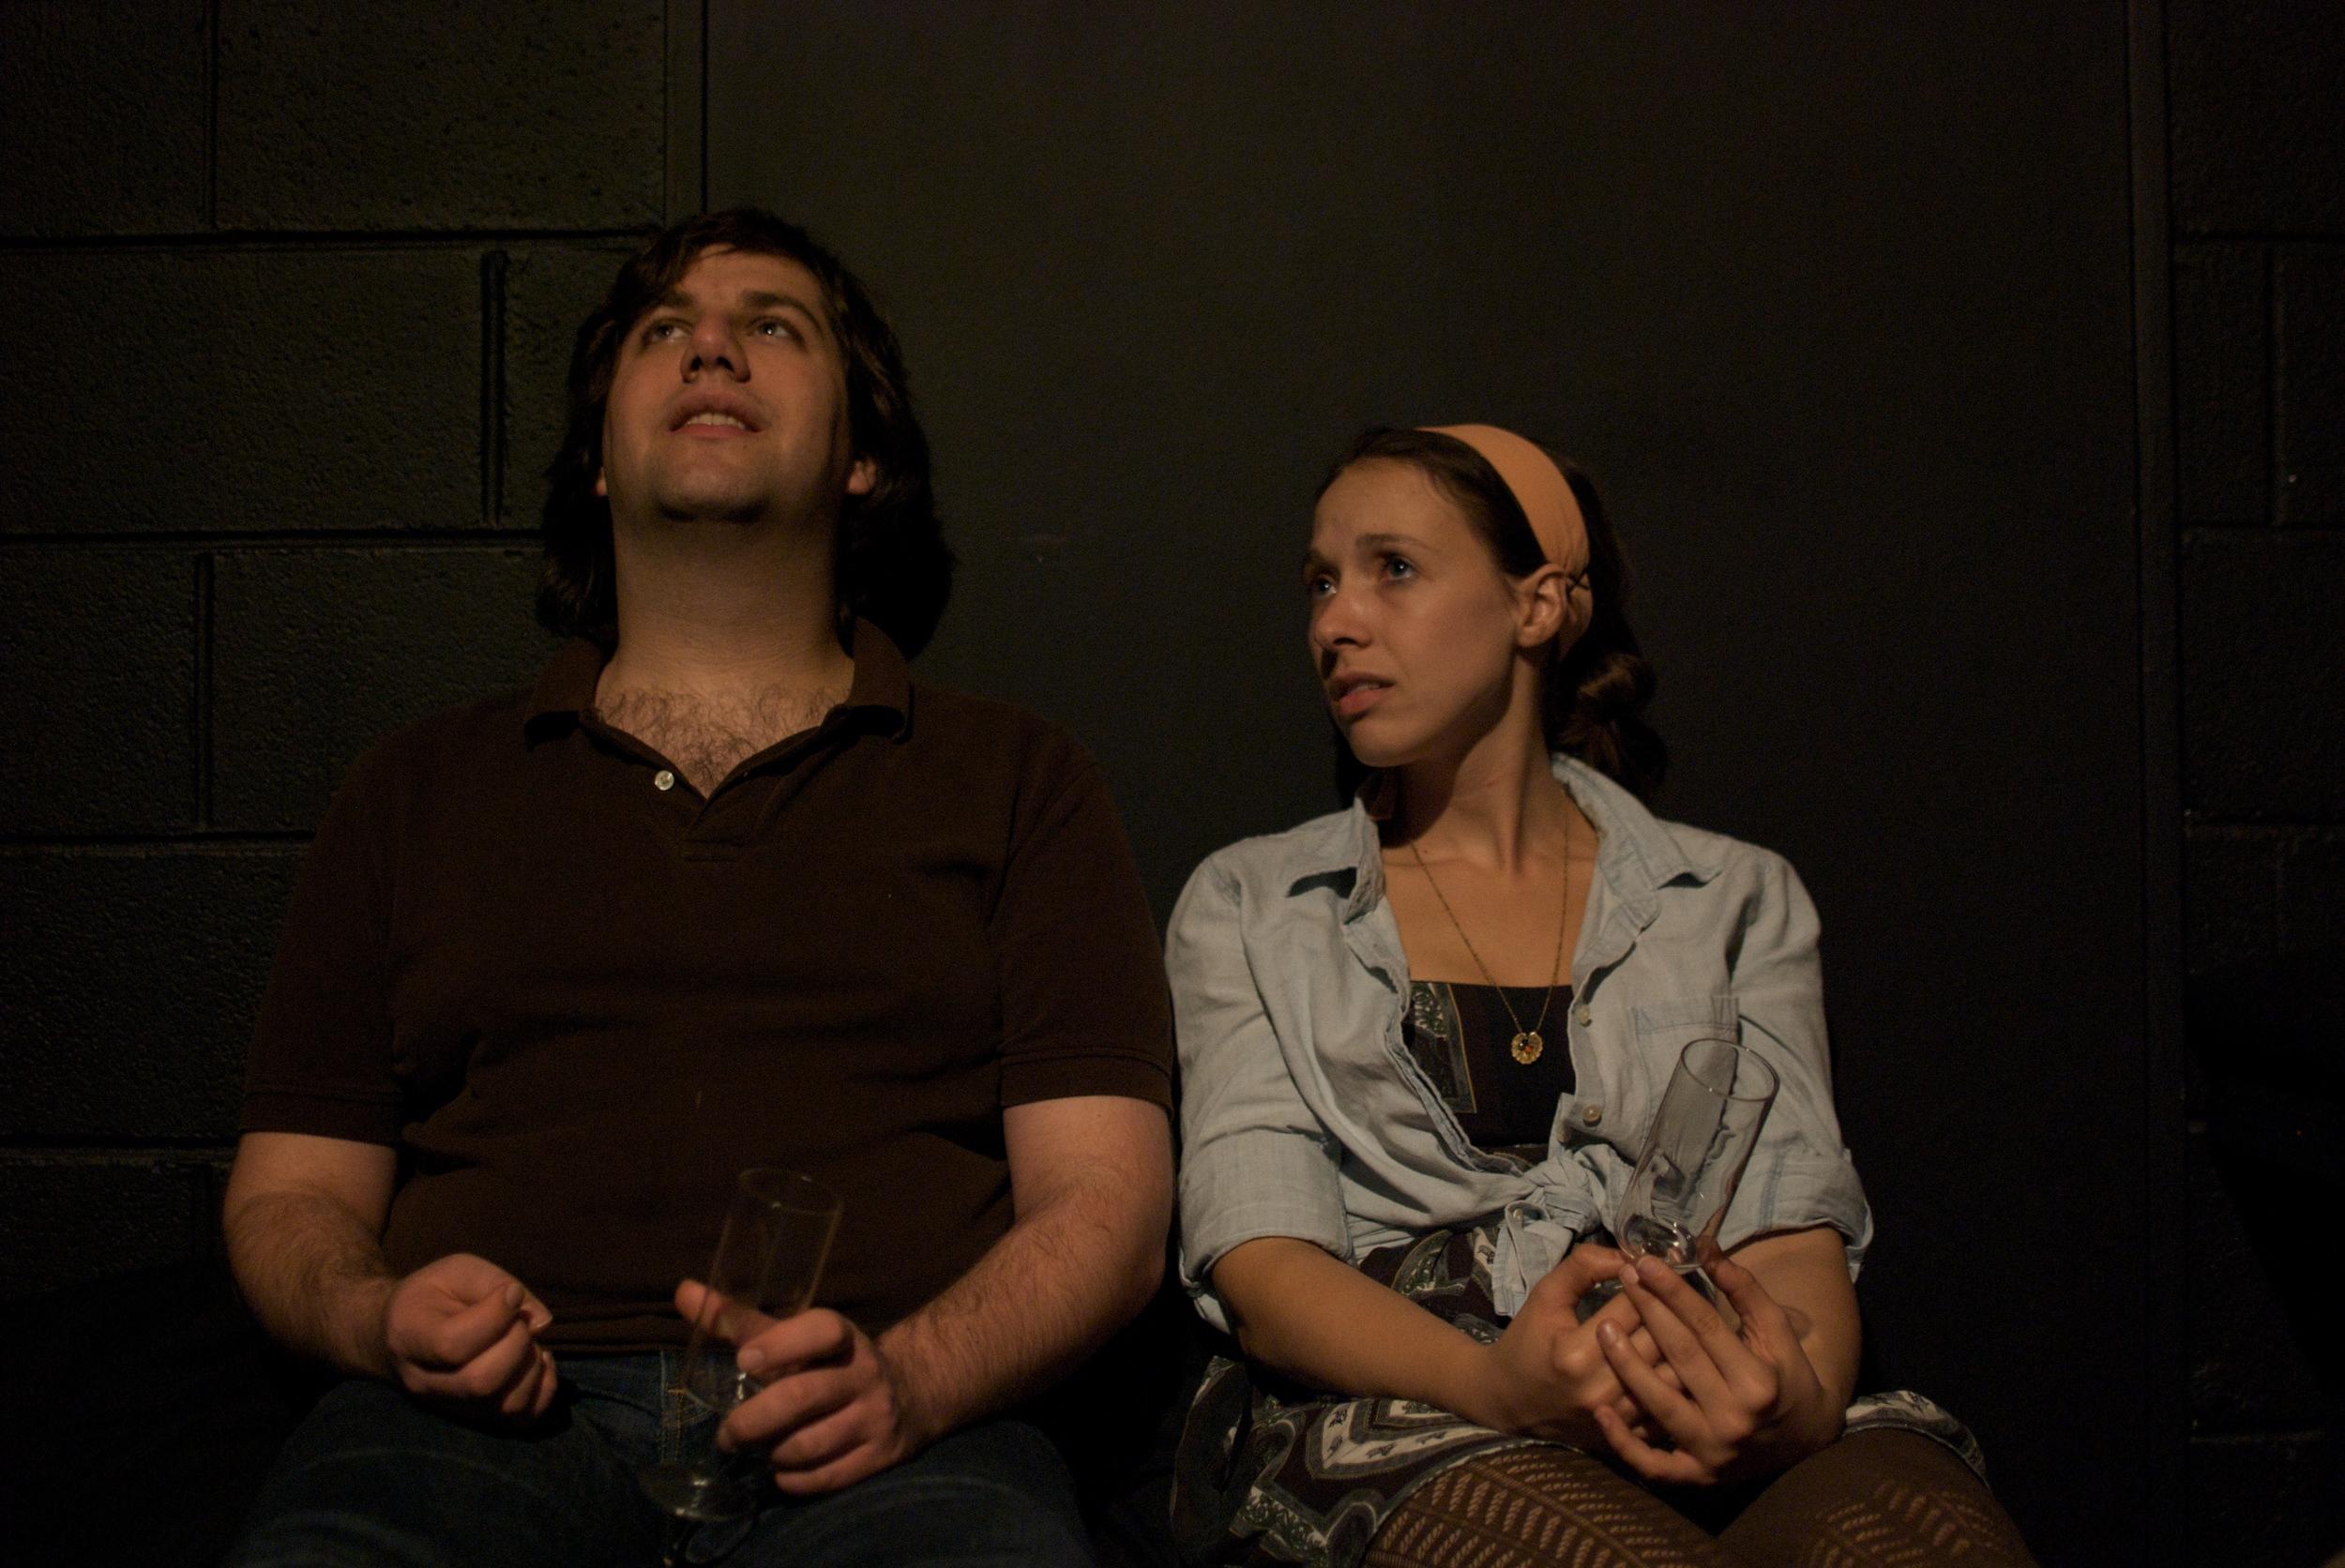 Zev Valancy and Susan Myburgh